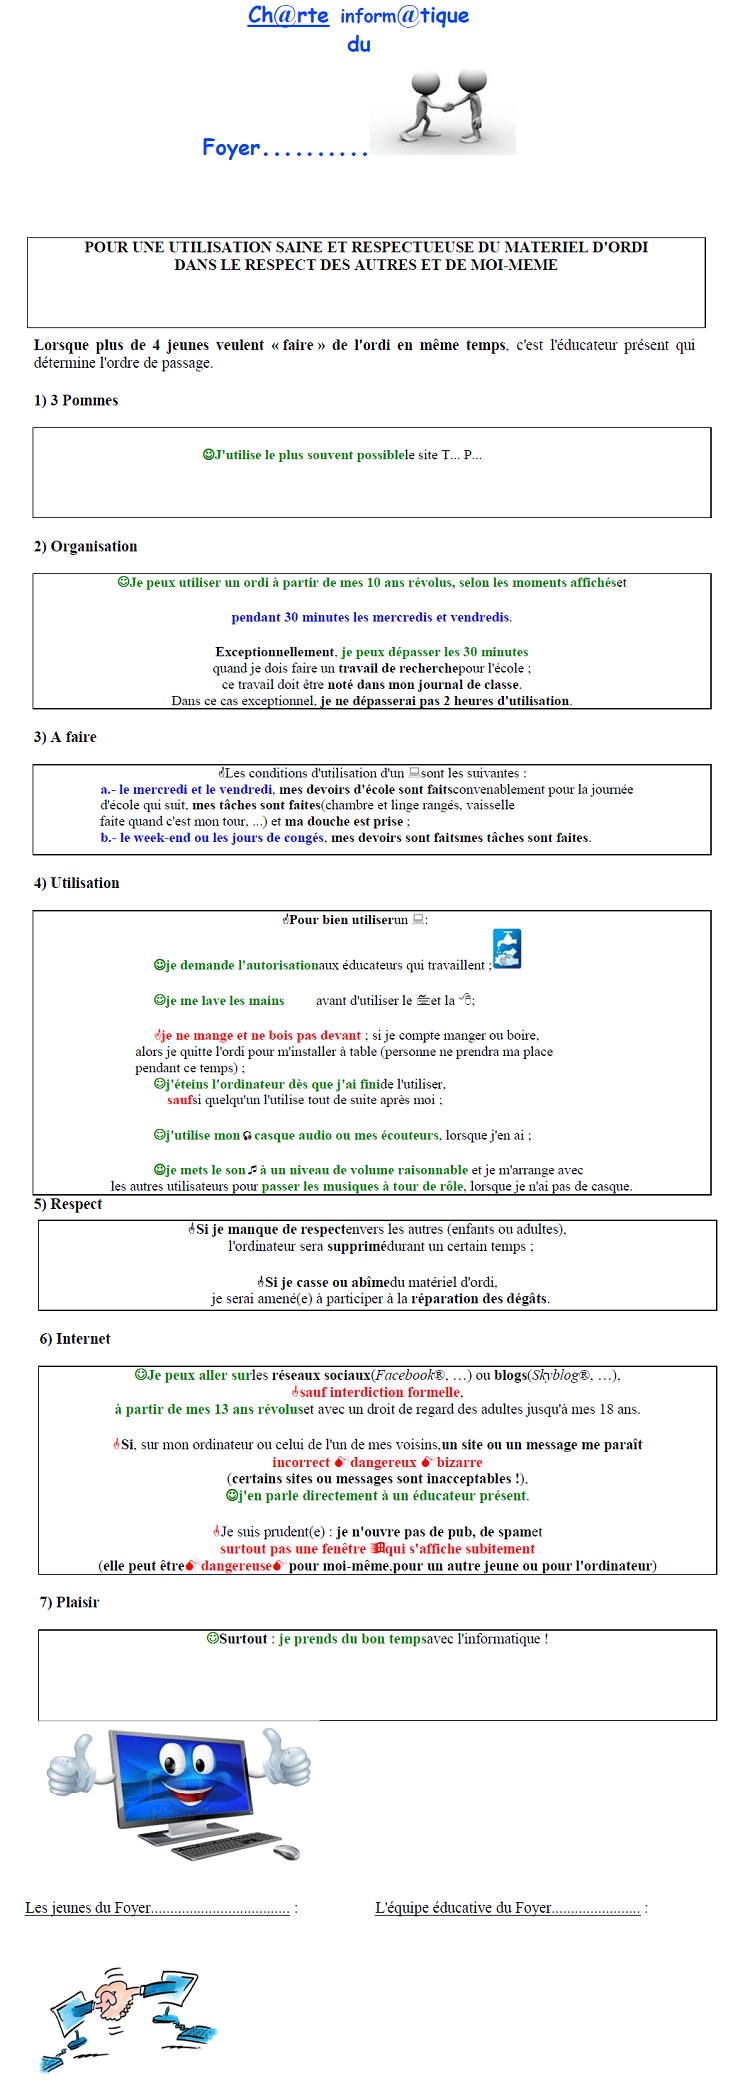 Charte informatique